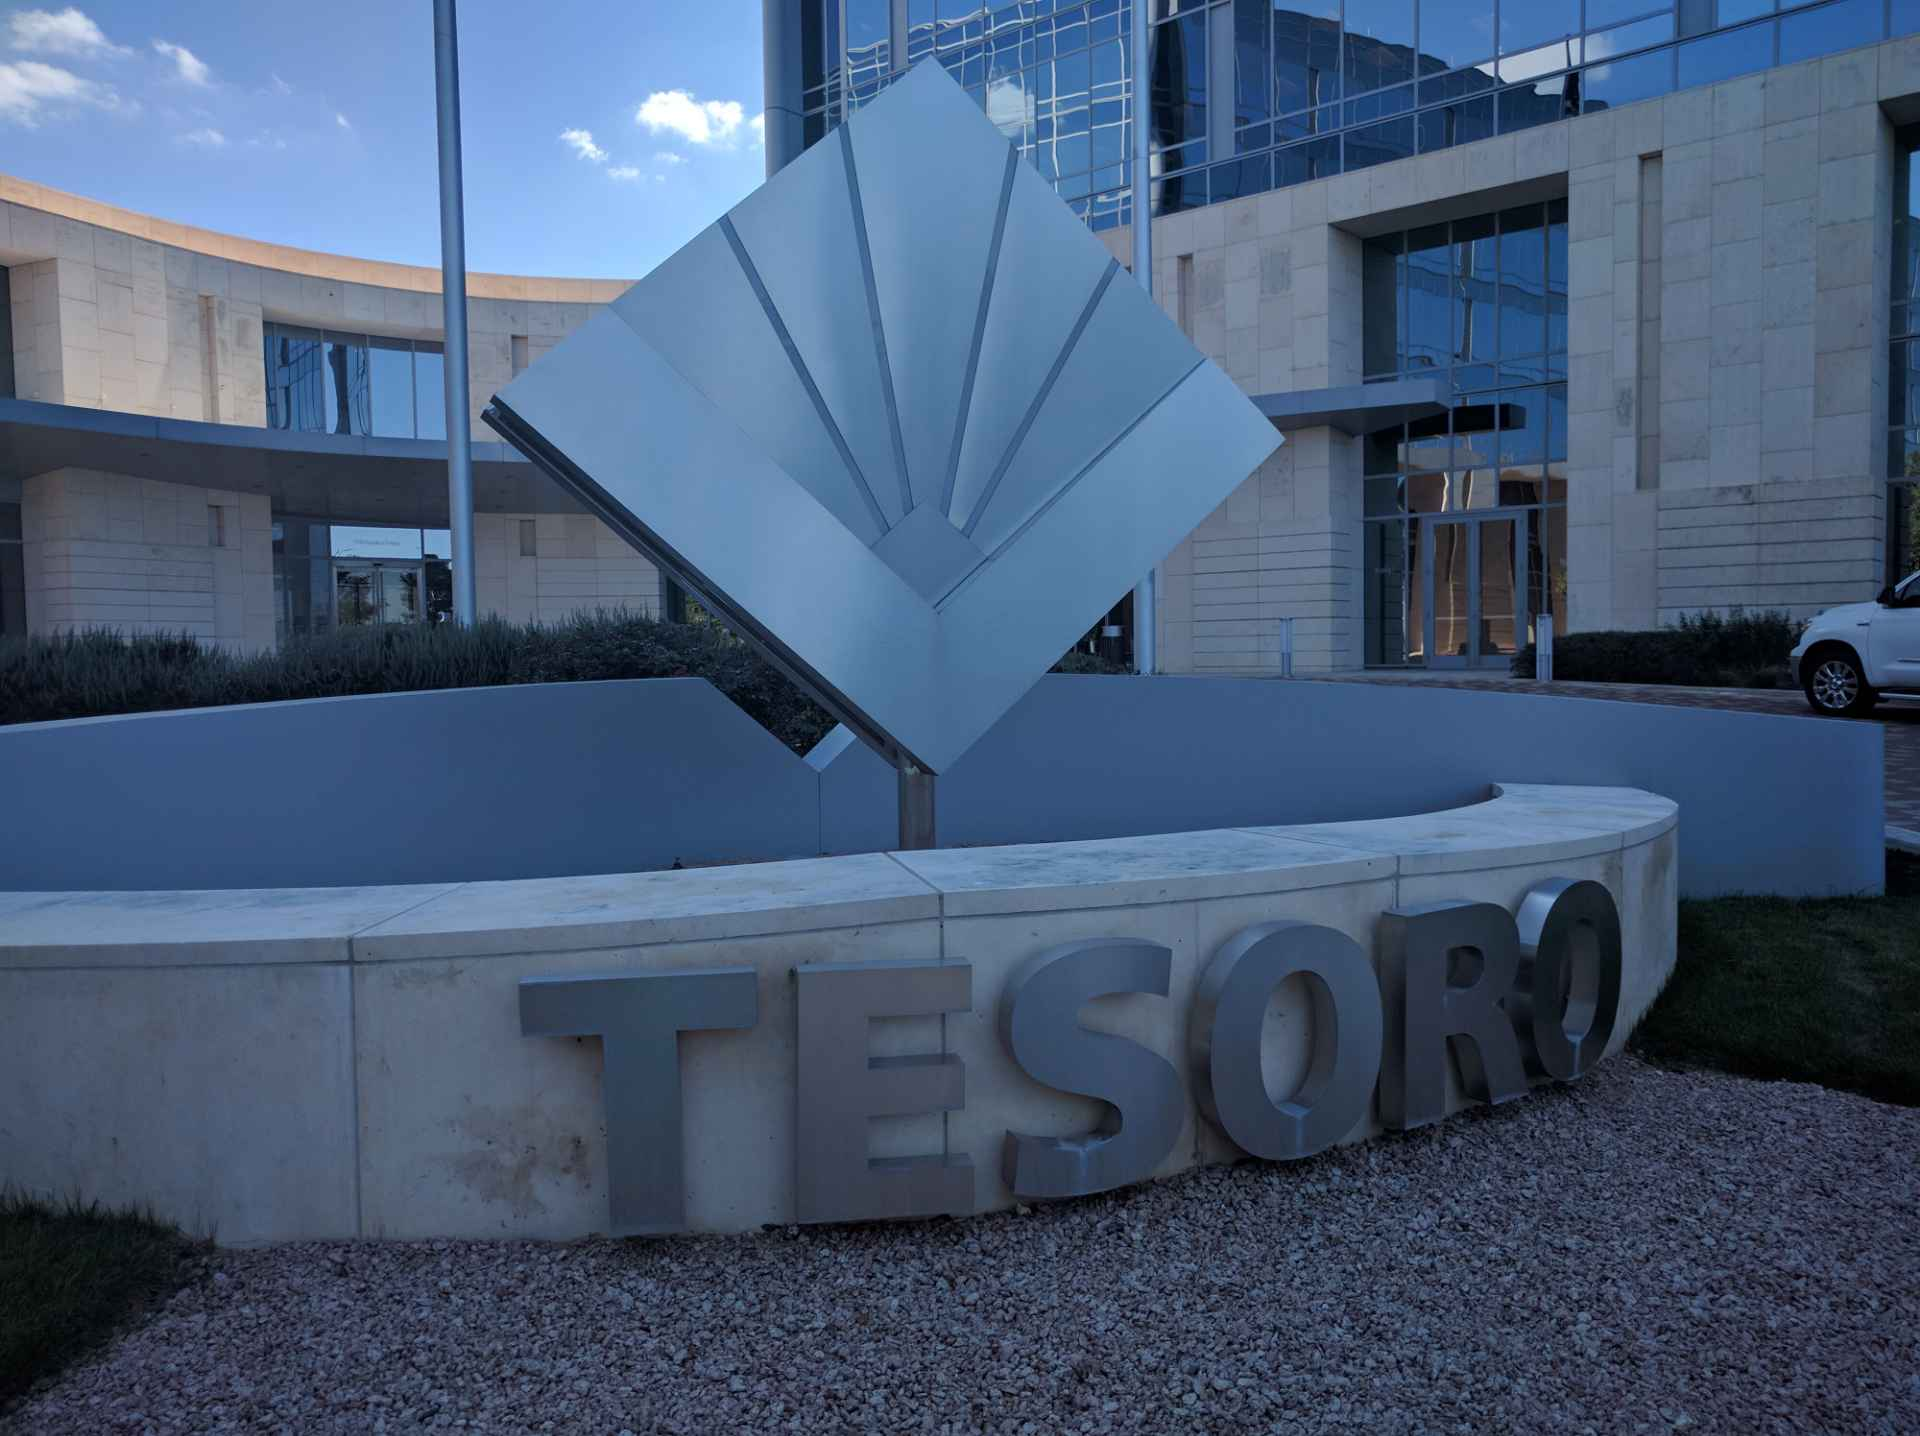 Tesoro's corporate headquarters in San Antonio, Texas.